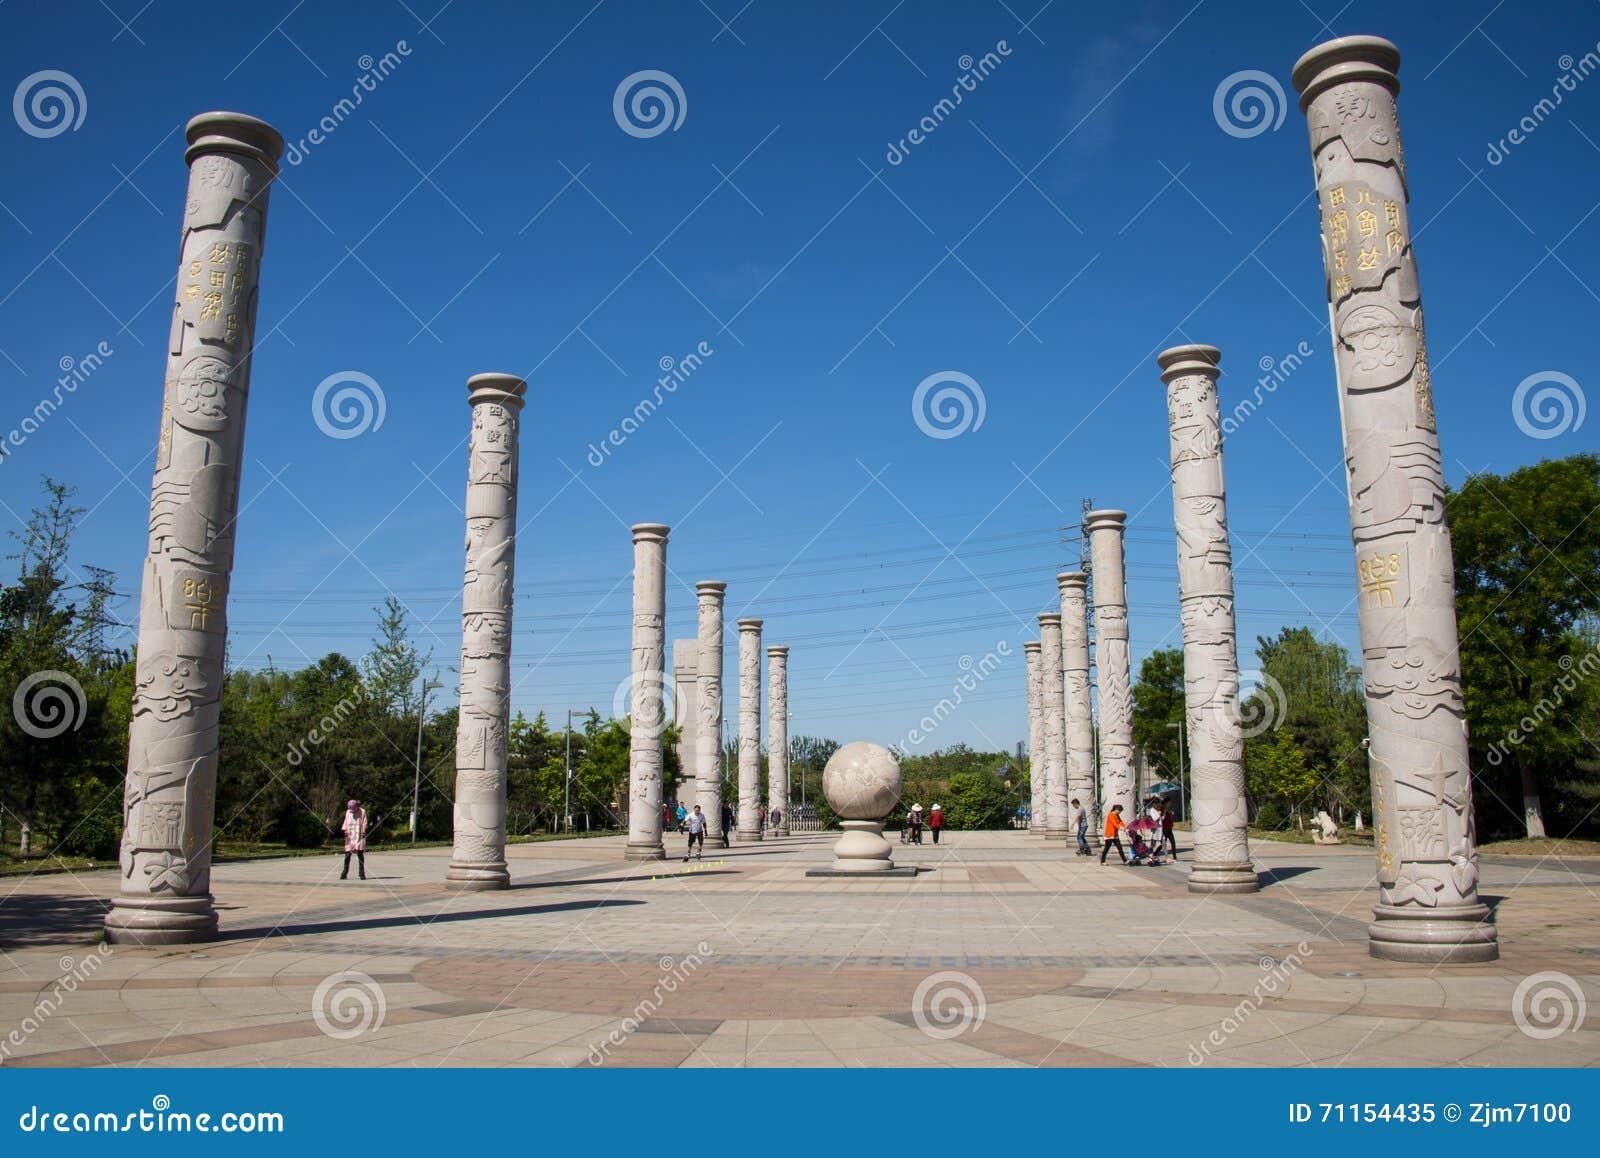 Asia China, Beijing, Yang Shan Park, totem pole